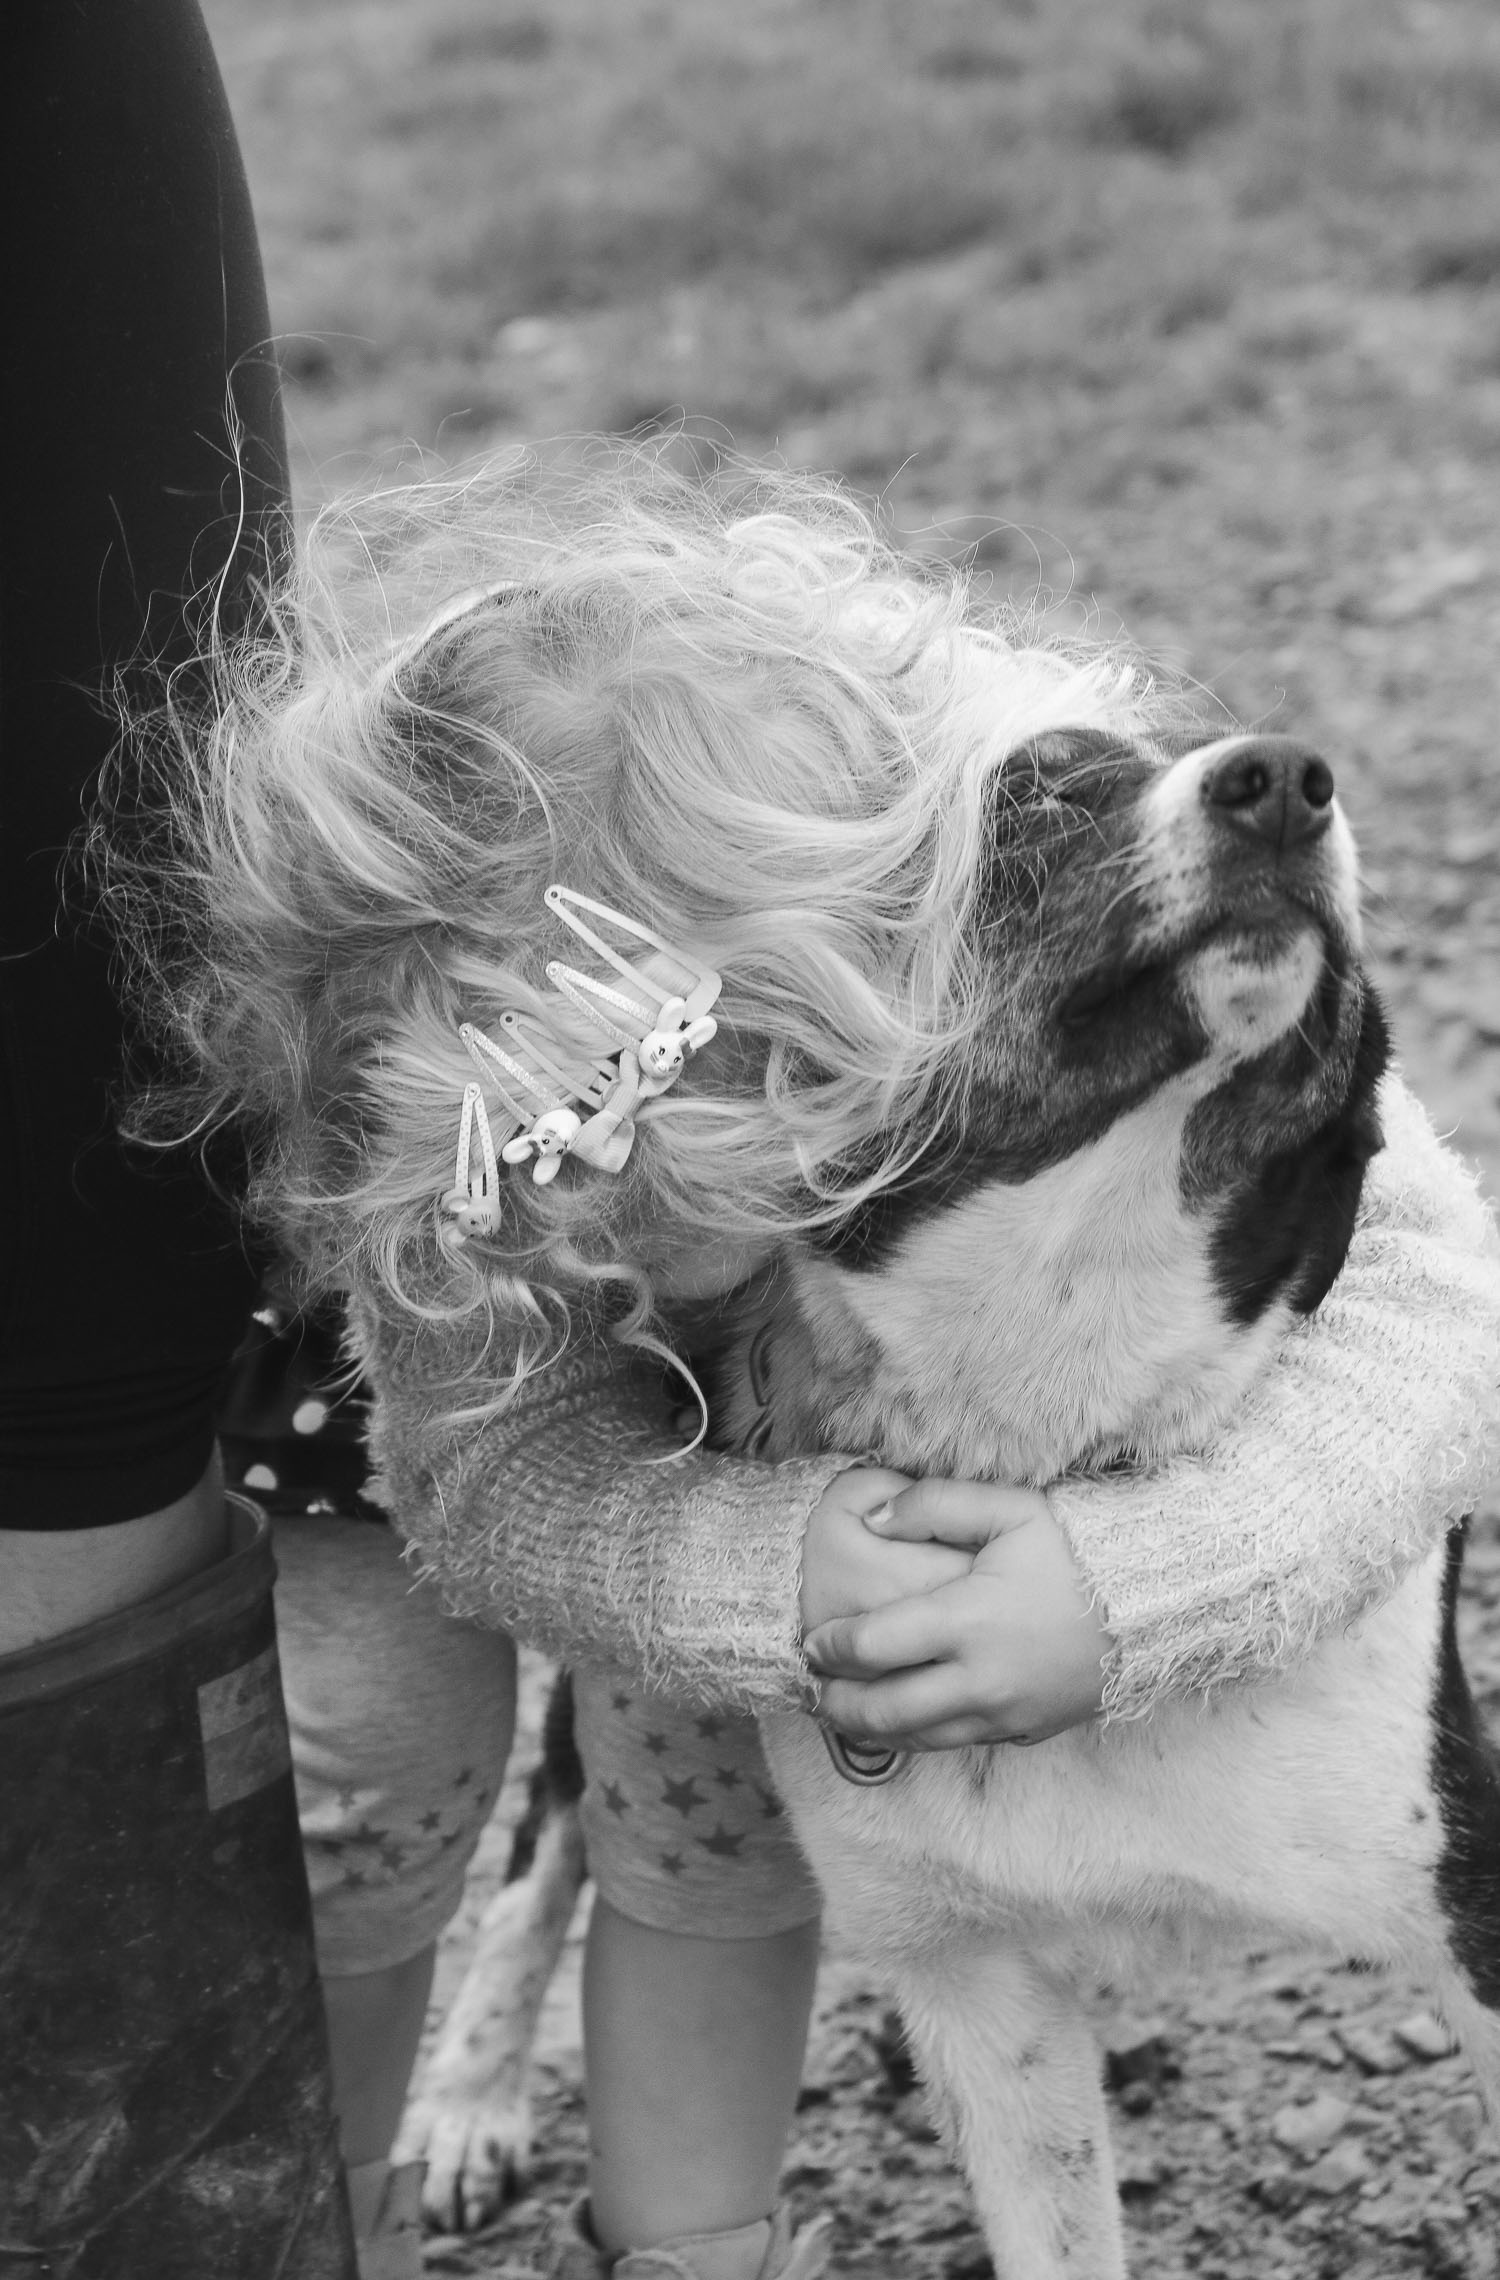 little-girl-wild-blode-curly-hair-holds-onto-farm-dog